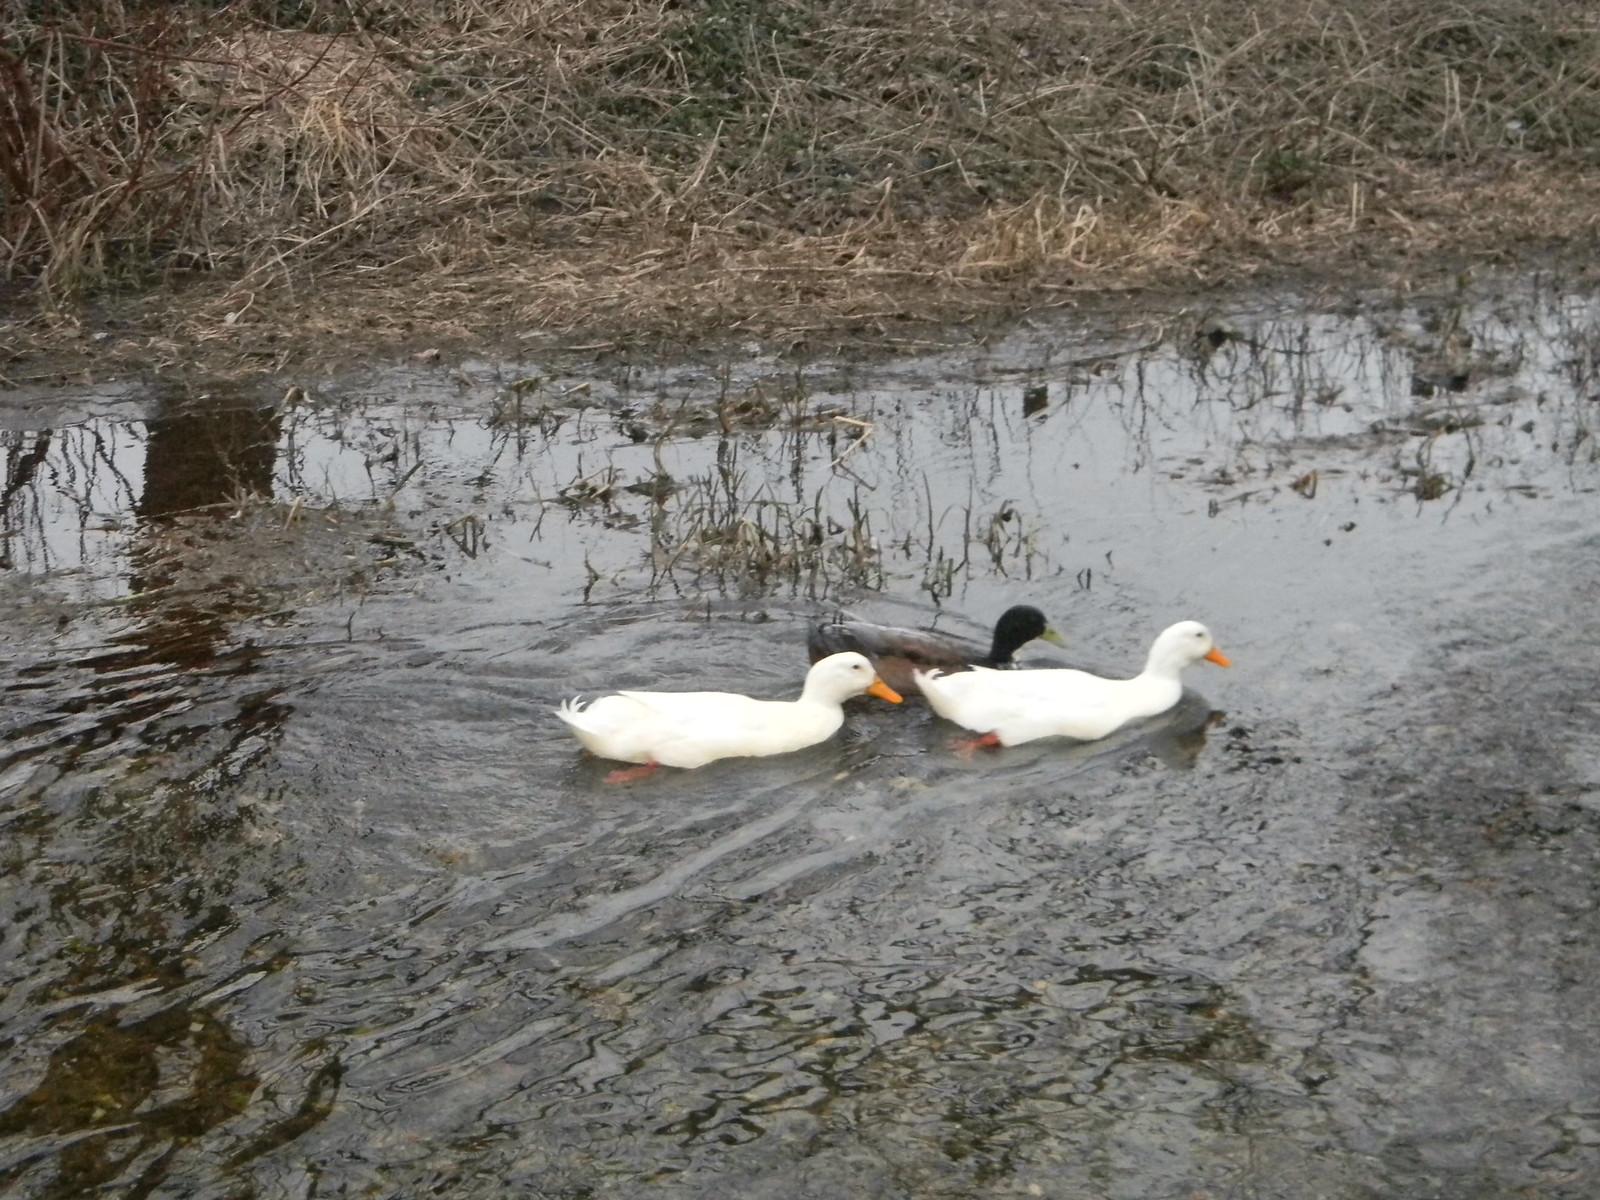 Ducks (Like swans but with shorter necks). Eynsford Circular